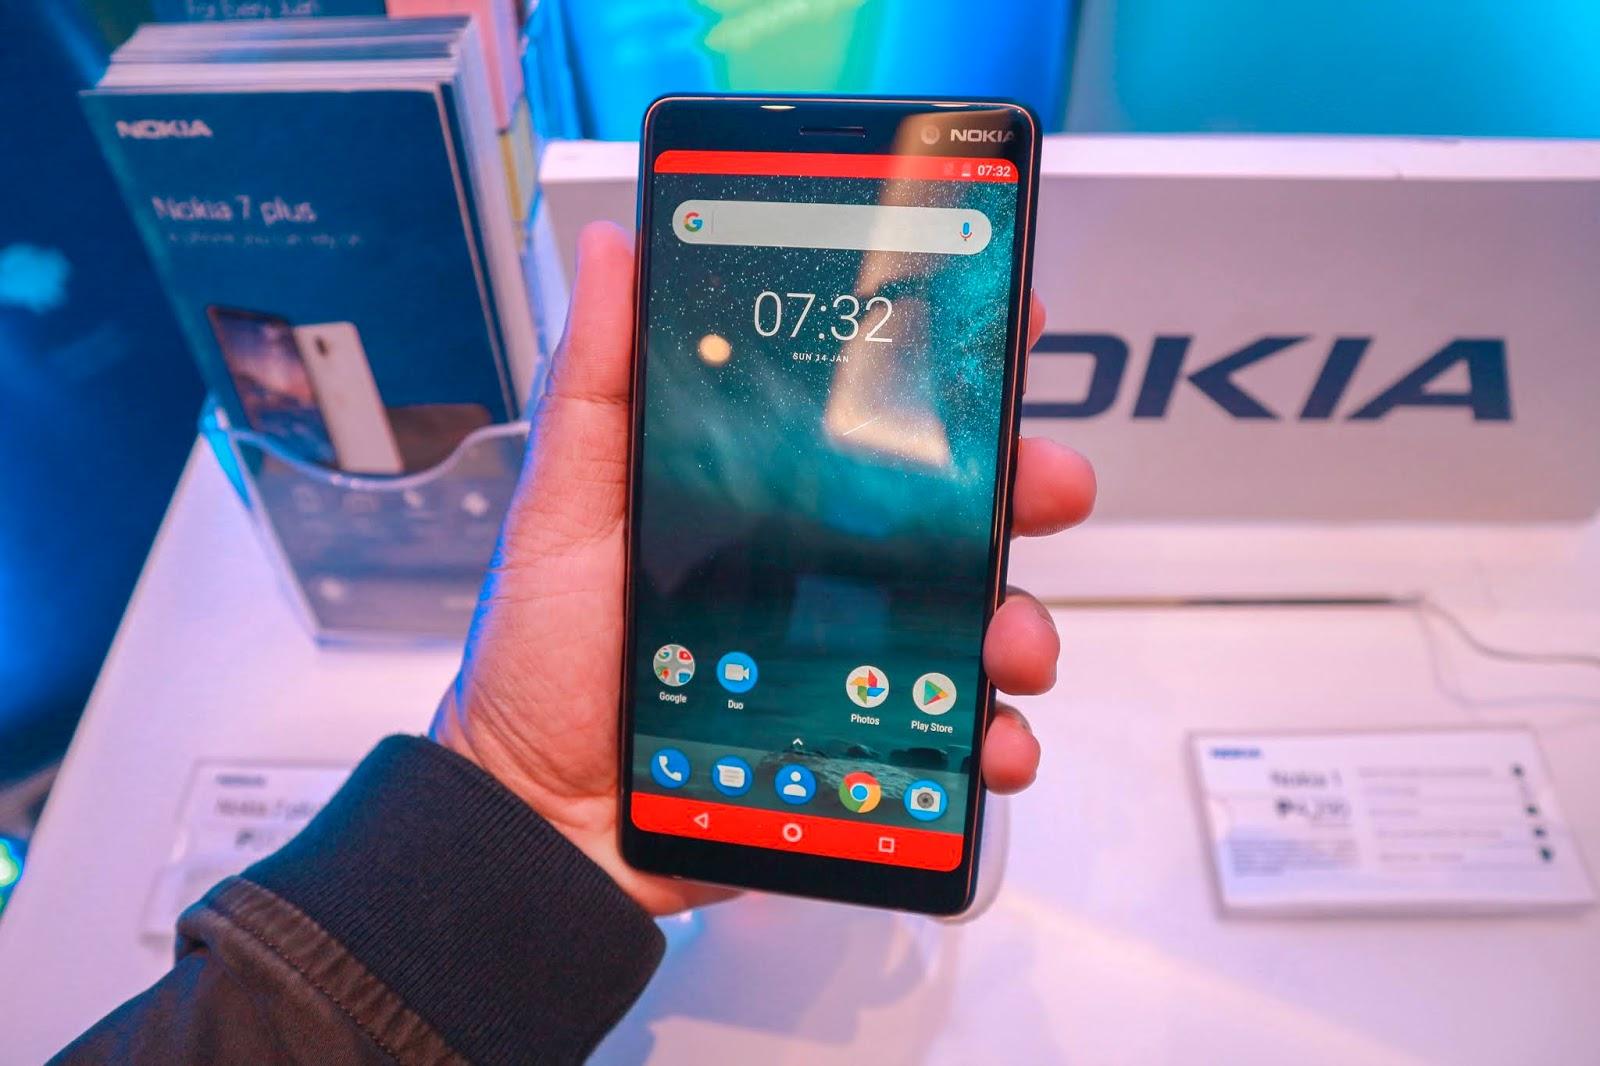 Nokia 7 plus Nokia 6 Nokia 7 Nokia 8810 Nokia 1 Jexx Hinggo